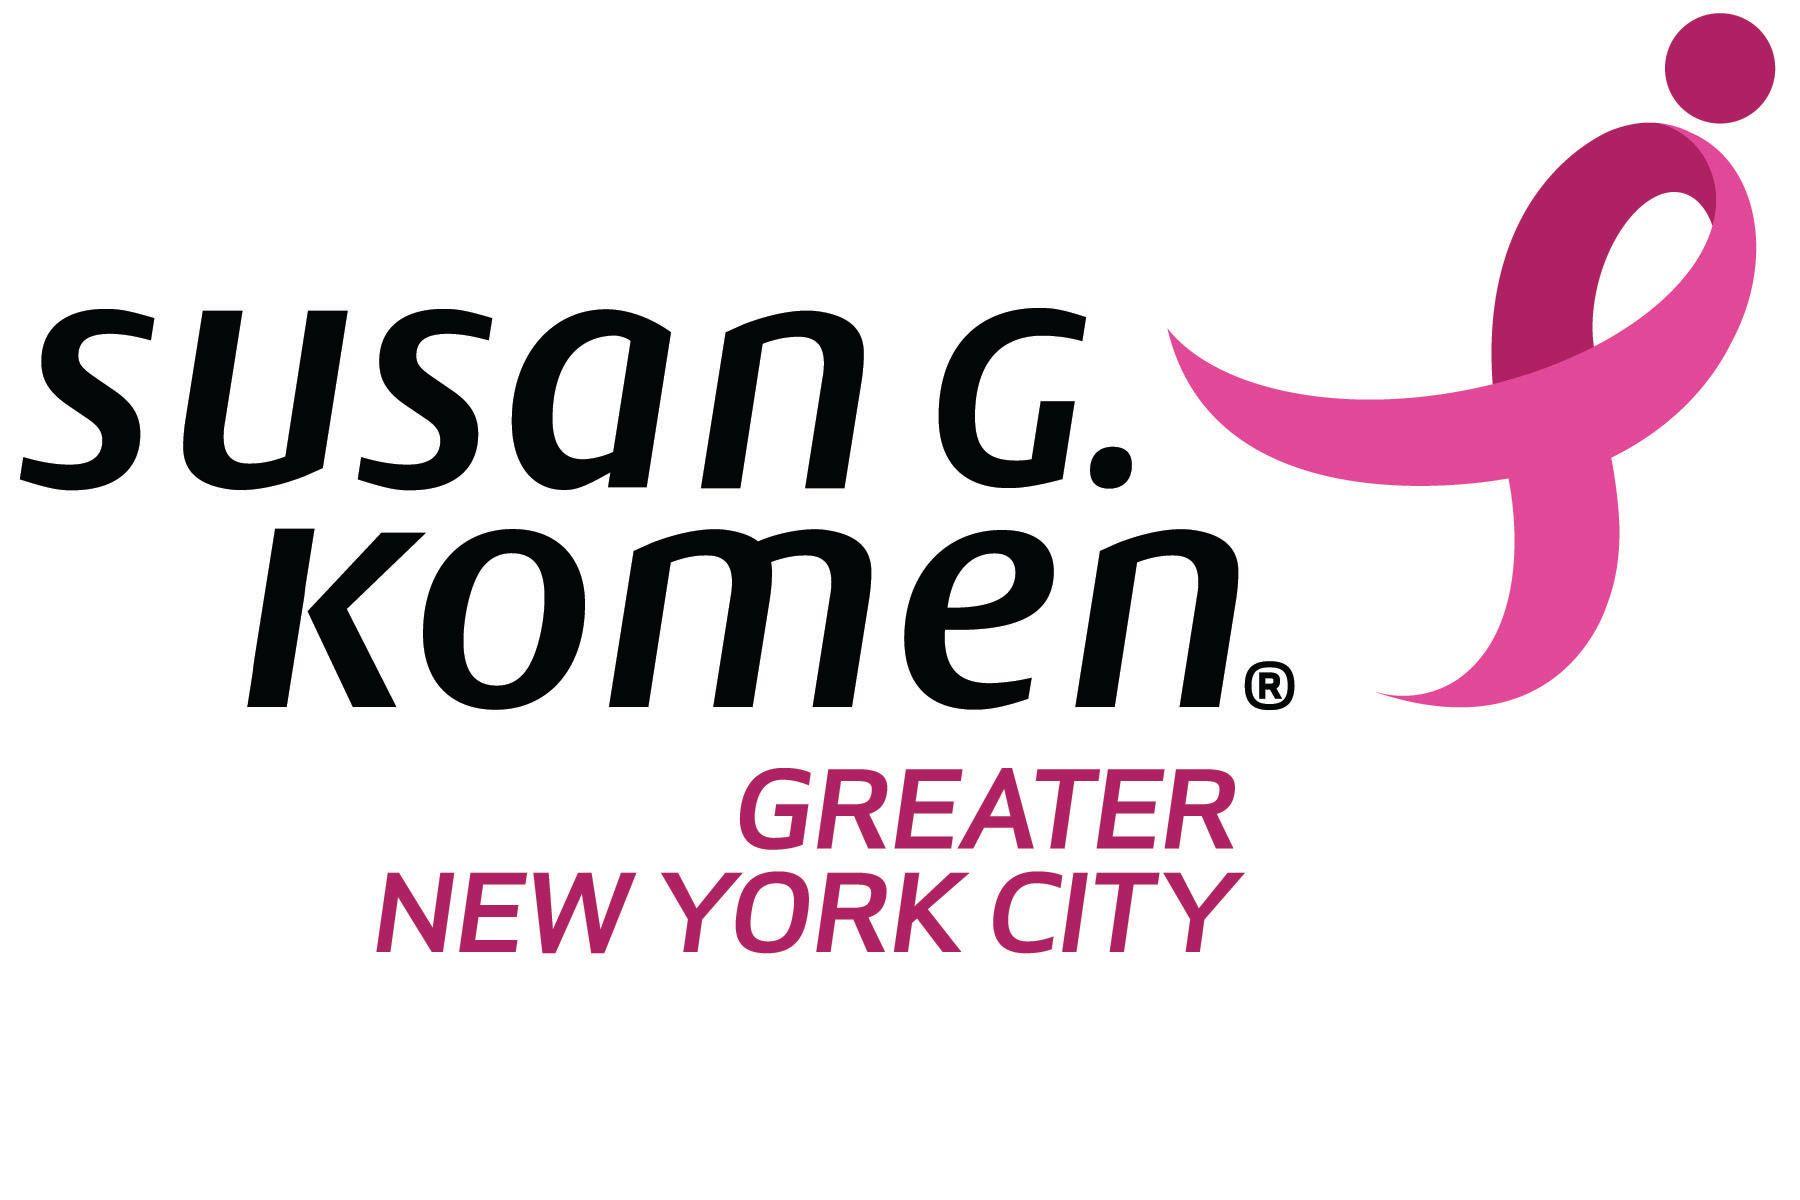 Susan G. Komen Greater New York City